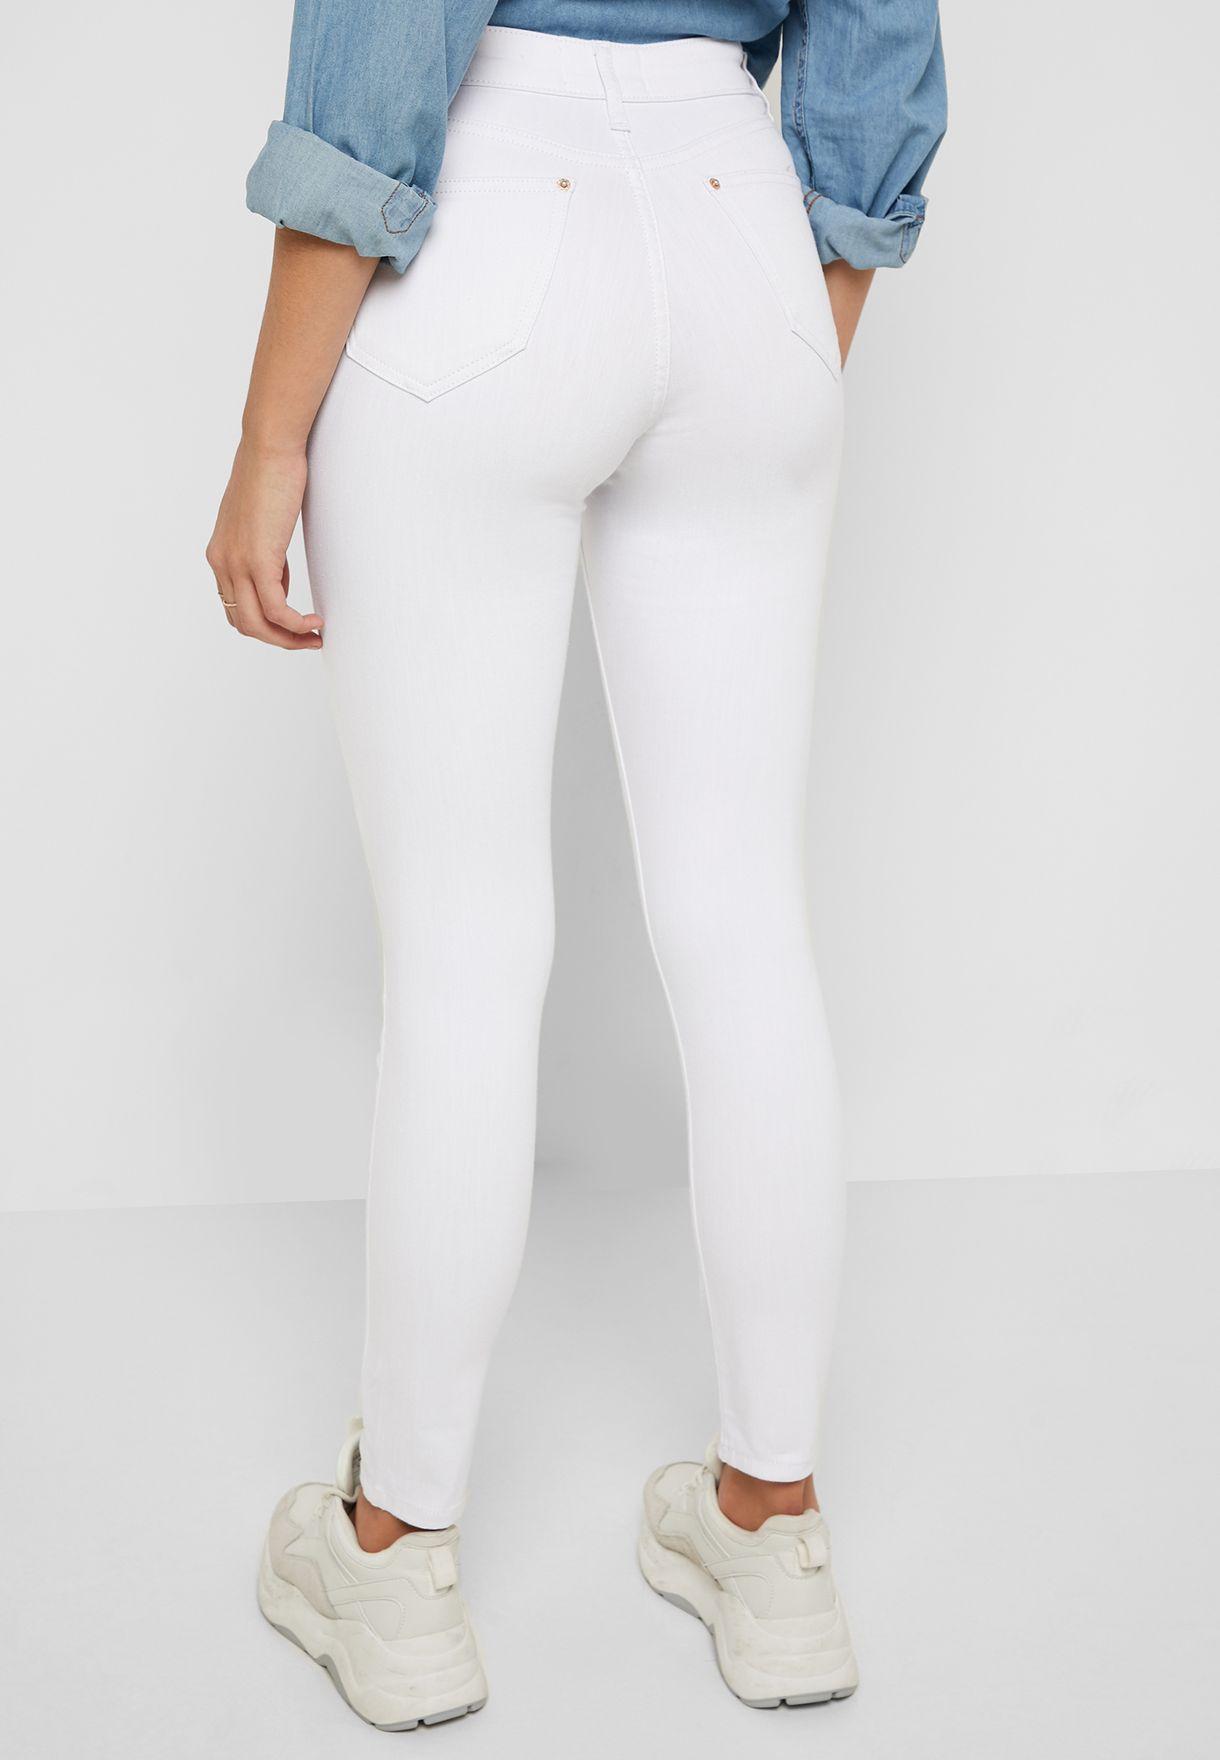 Lizzie Light Wash Skinny Jeans